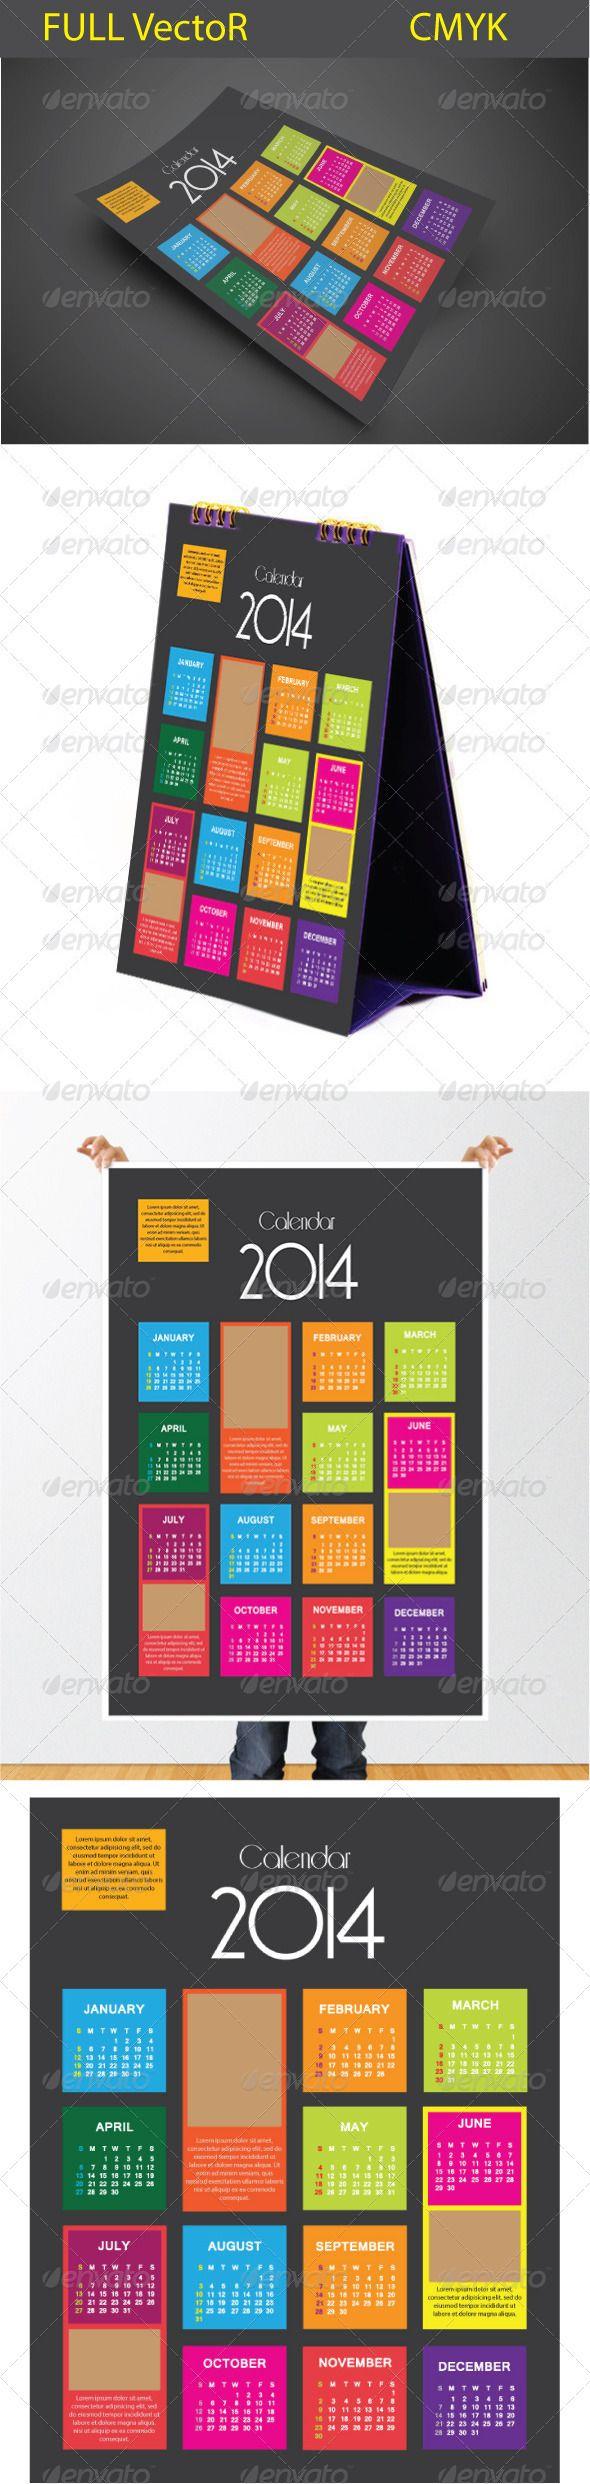 Calendar Design For Website : Best images about corporate calendar design on pinterest